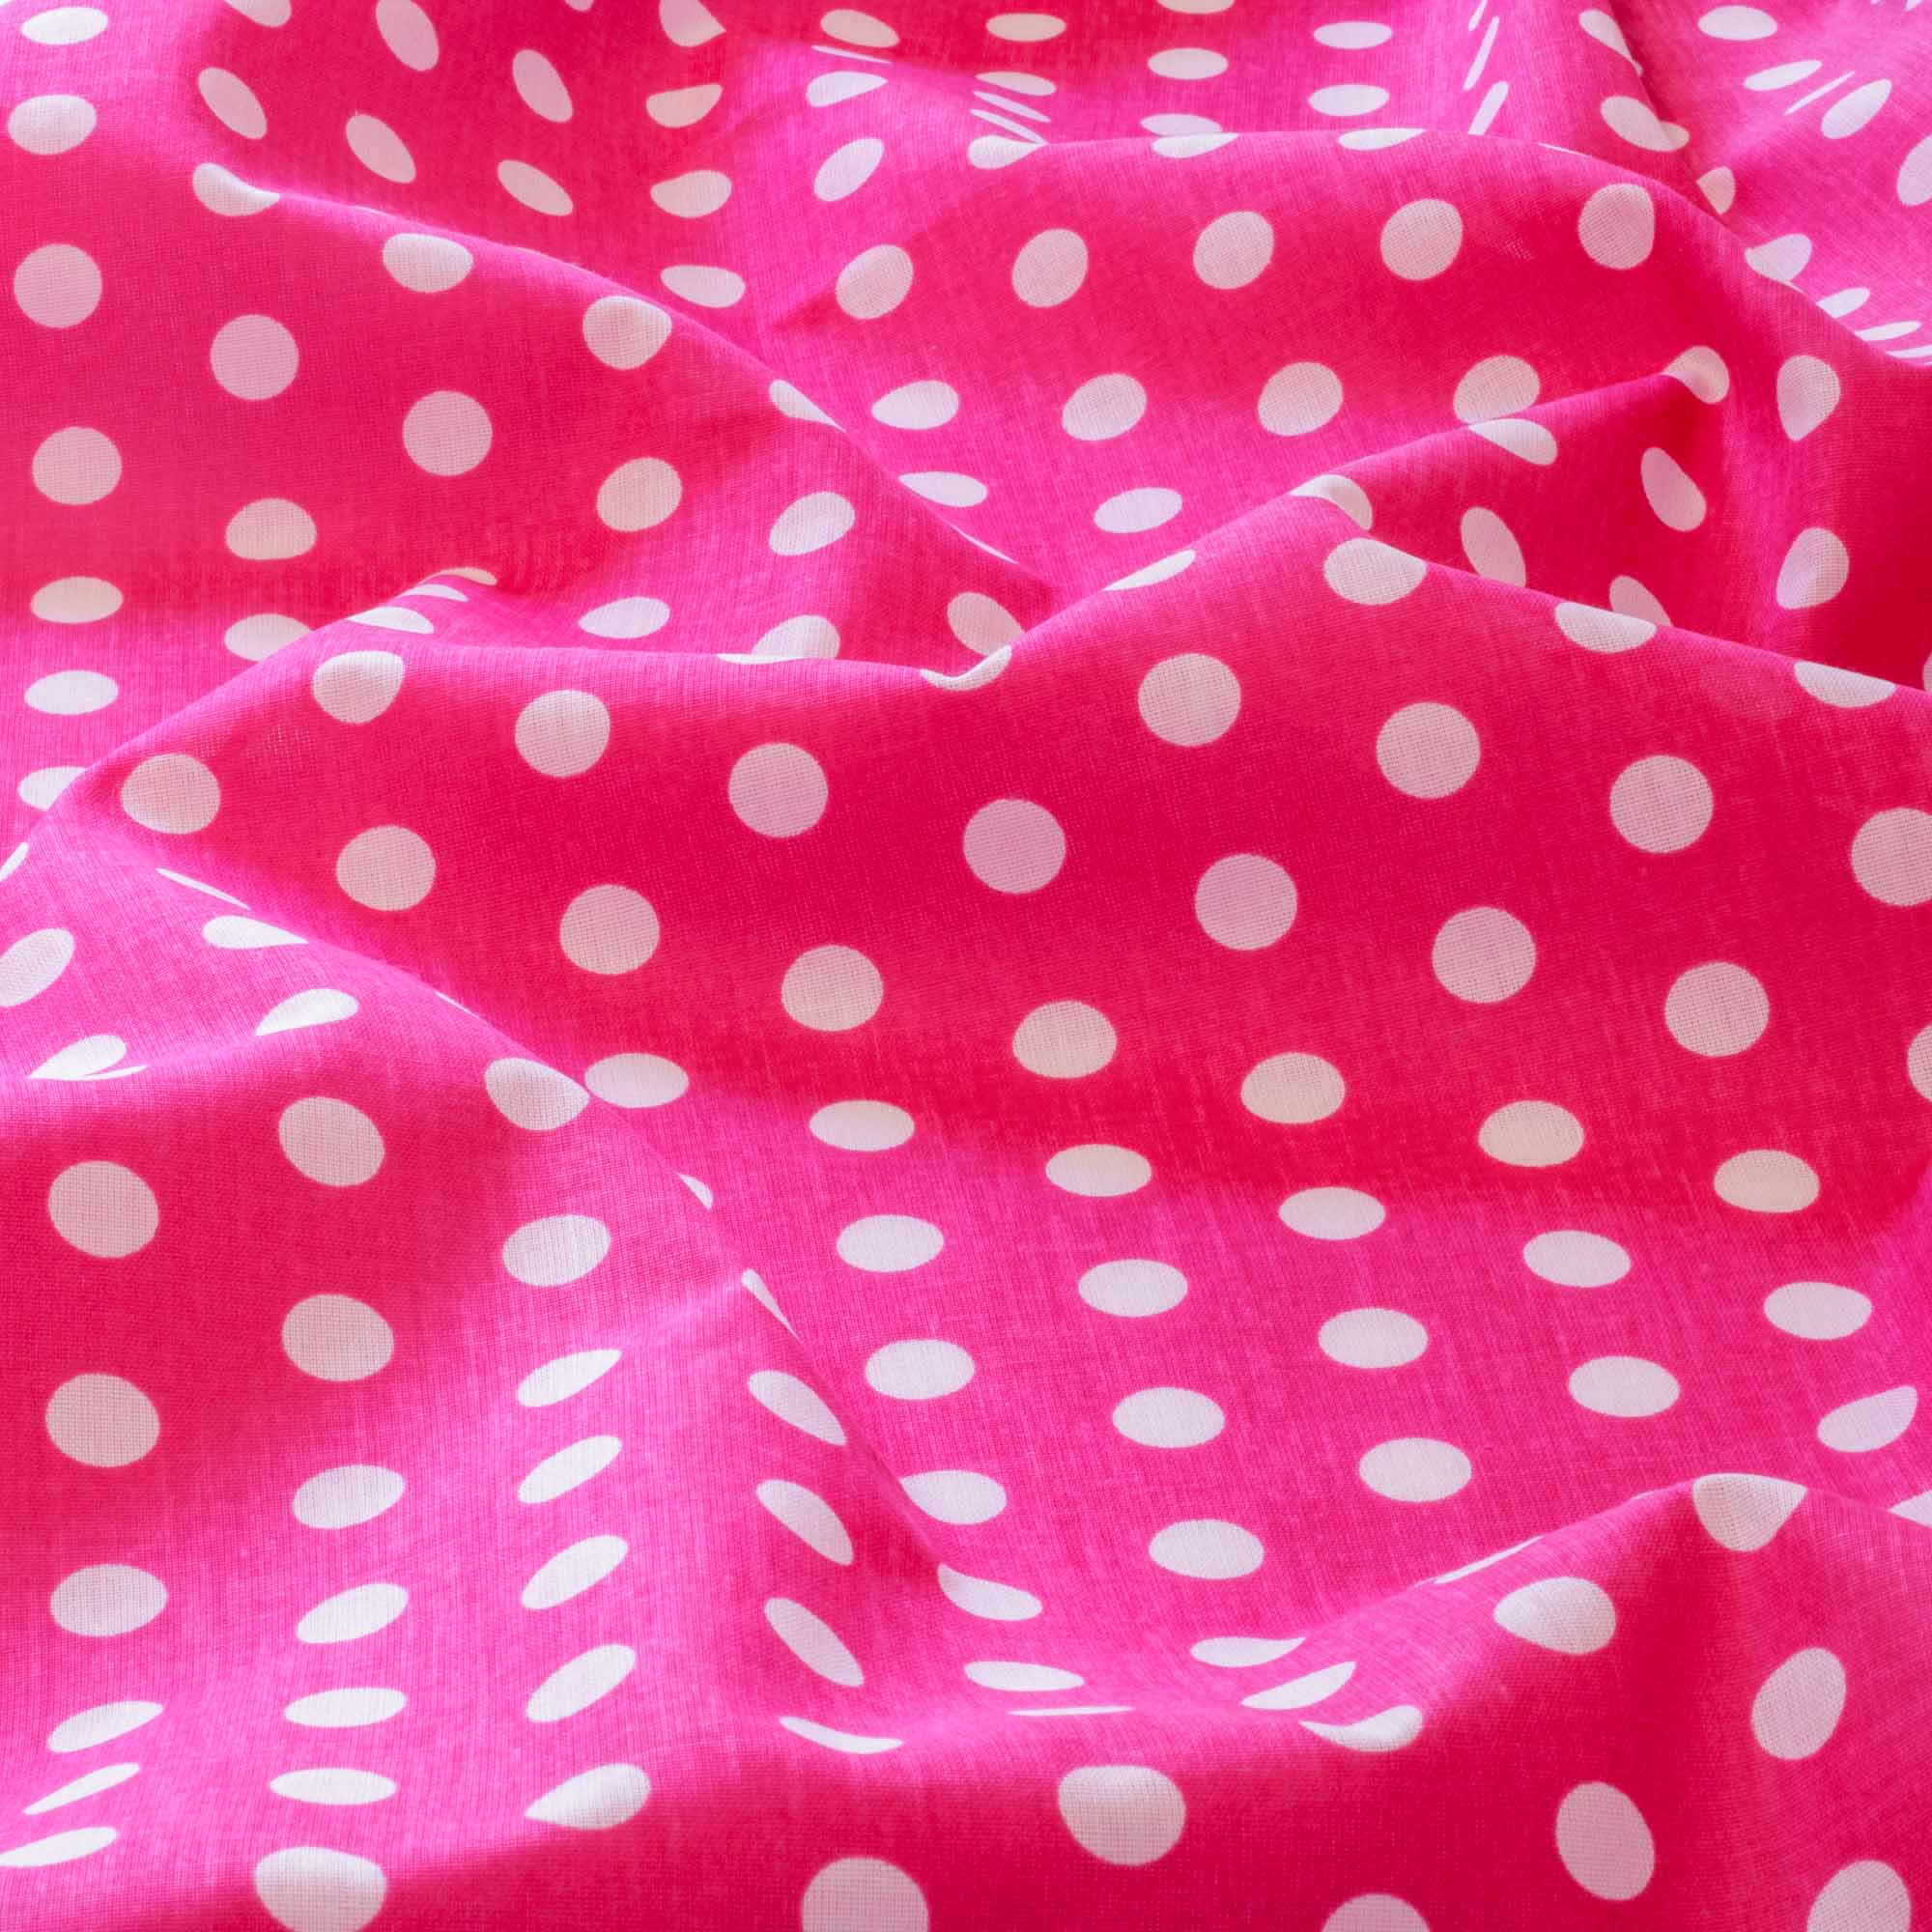 Tecido tricoline poa bolas brancas 1,40 m largura fundo rosa pink